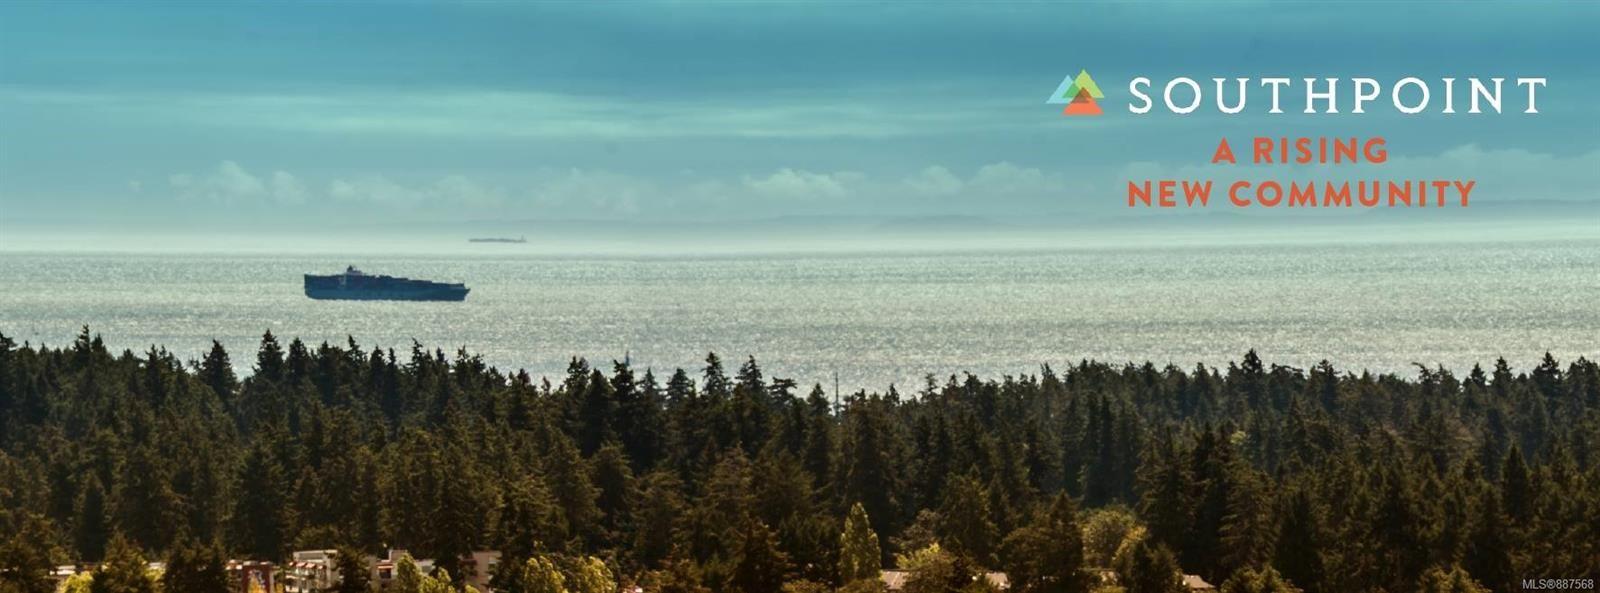 Main Photo: 1378 Sandstone Lane in : La Bear Mountain Land for sale (Langford)  : MLS®# 887568